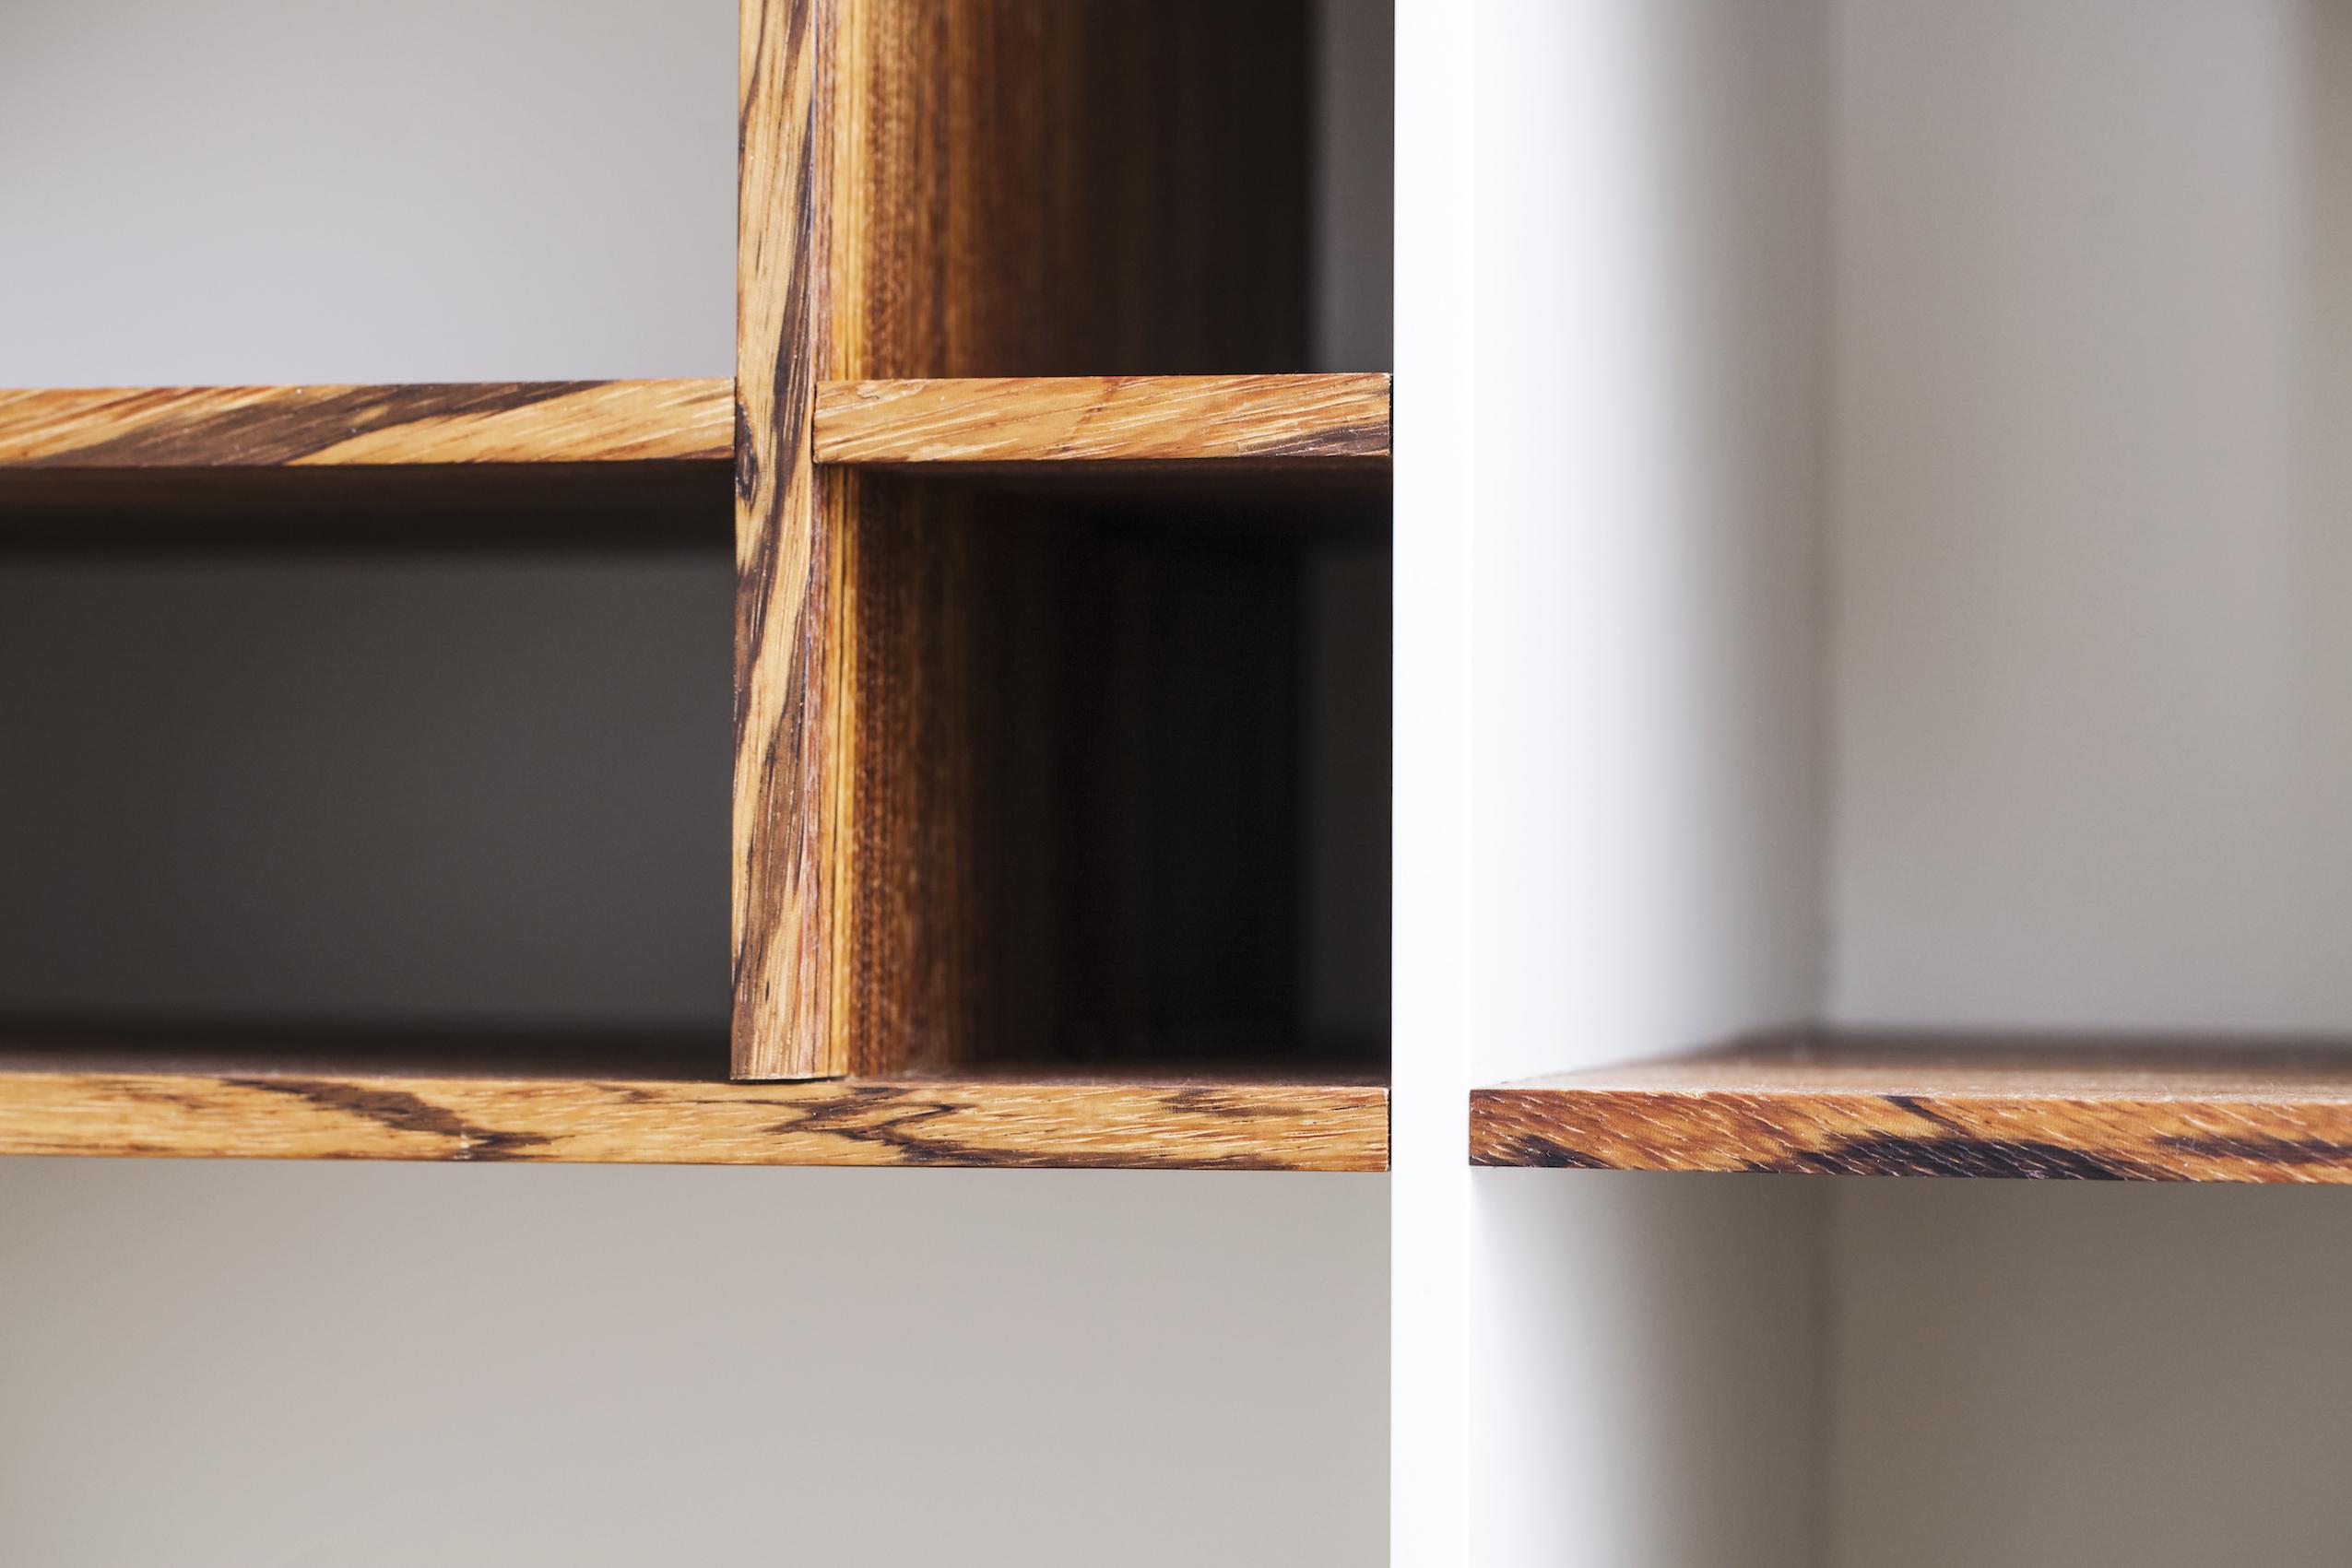 MondriaanKast_FotoIrisvanVliet_07 kopie